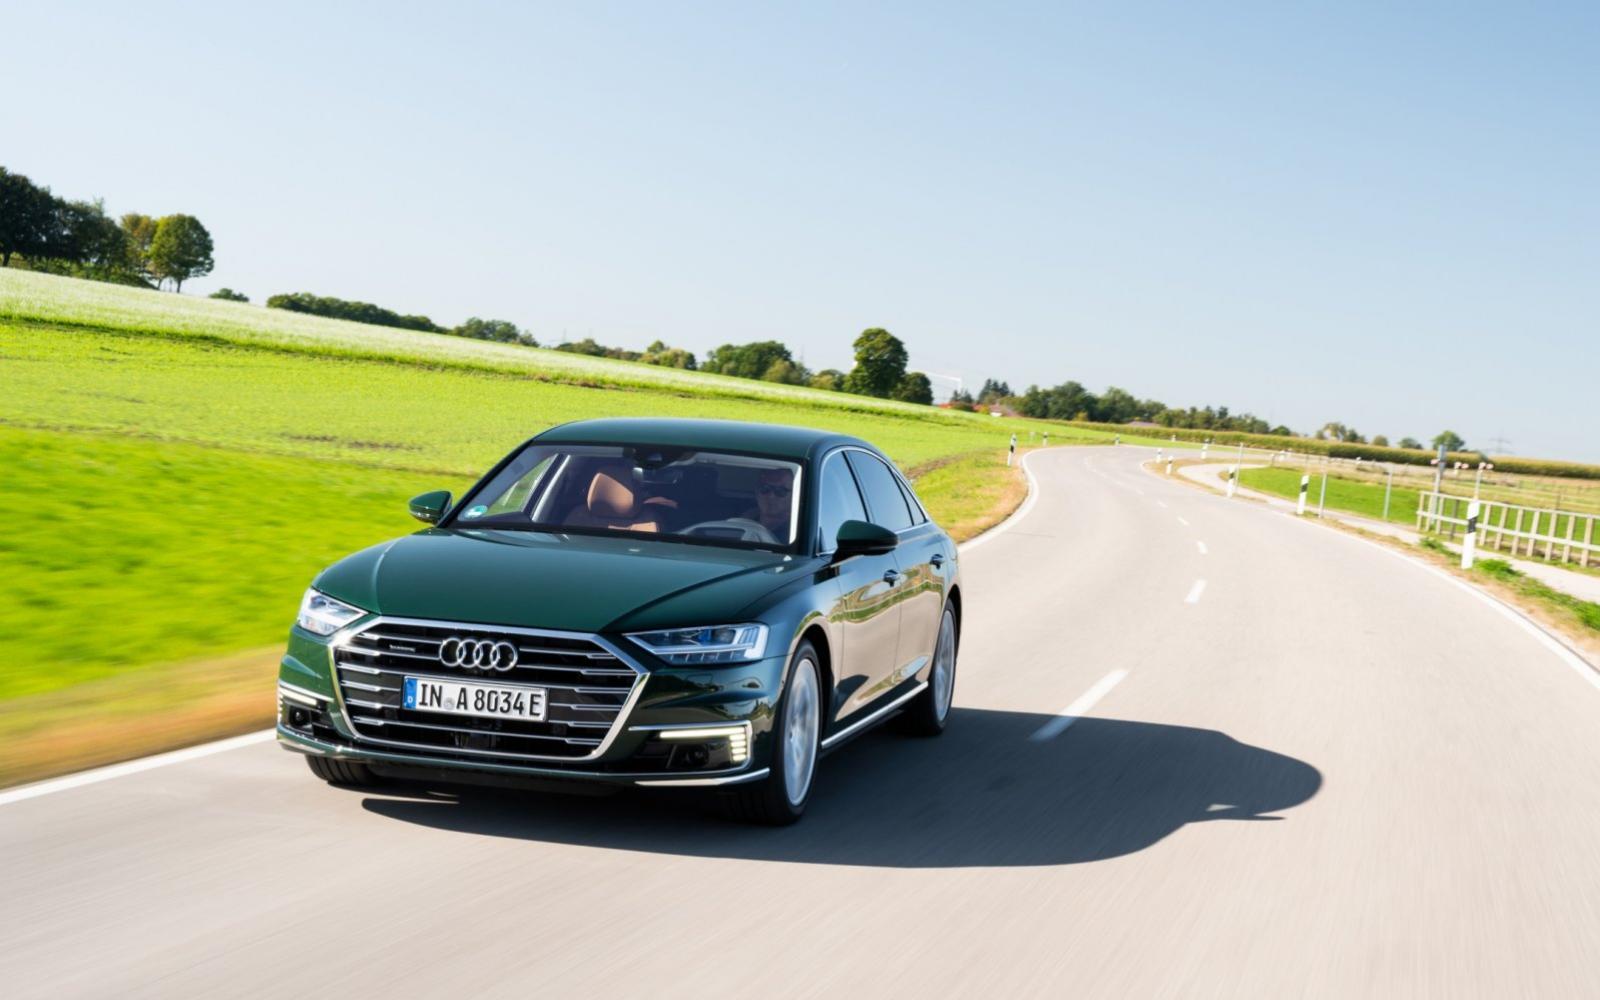 Audi A8 60 TFSI e deelt plug-in hybridetechniek met Bentley Bentayga